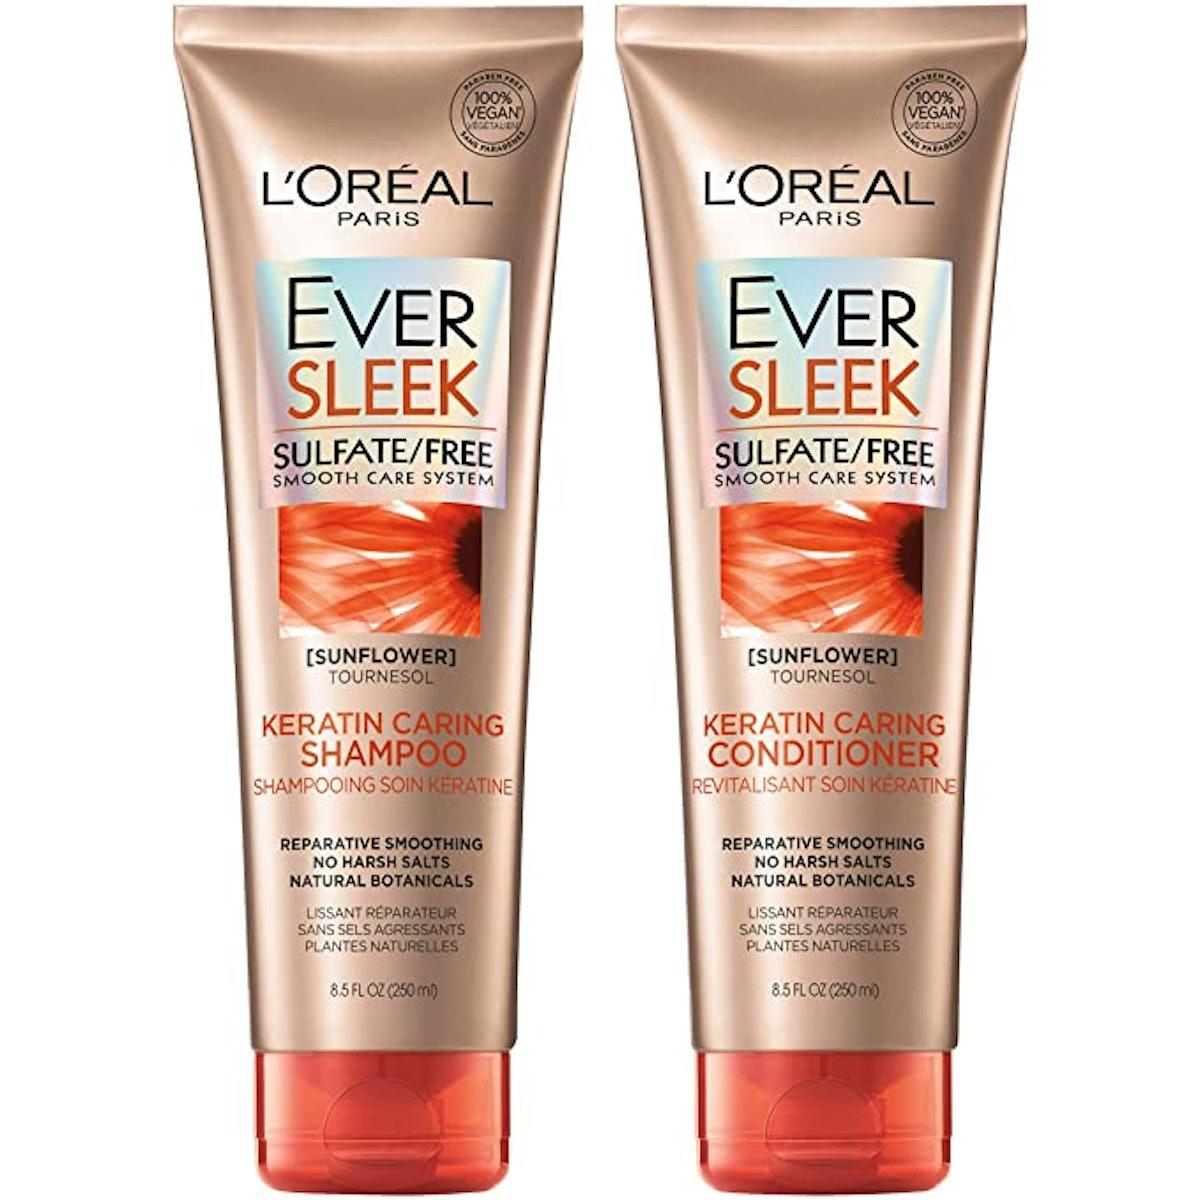 L'Oréal Paris EverSleek Keratin Caring Shampoo & Conditioner